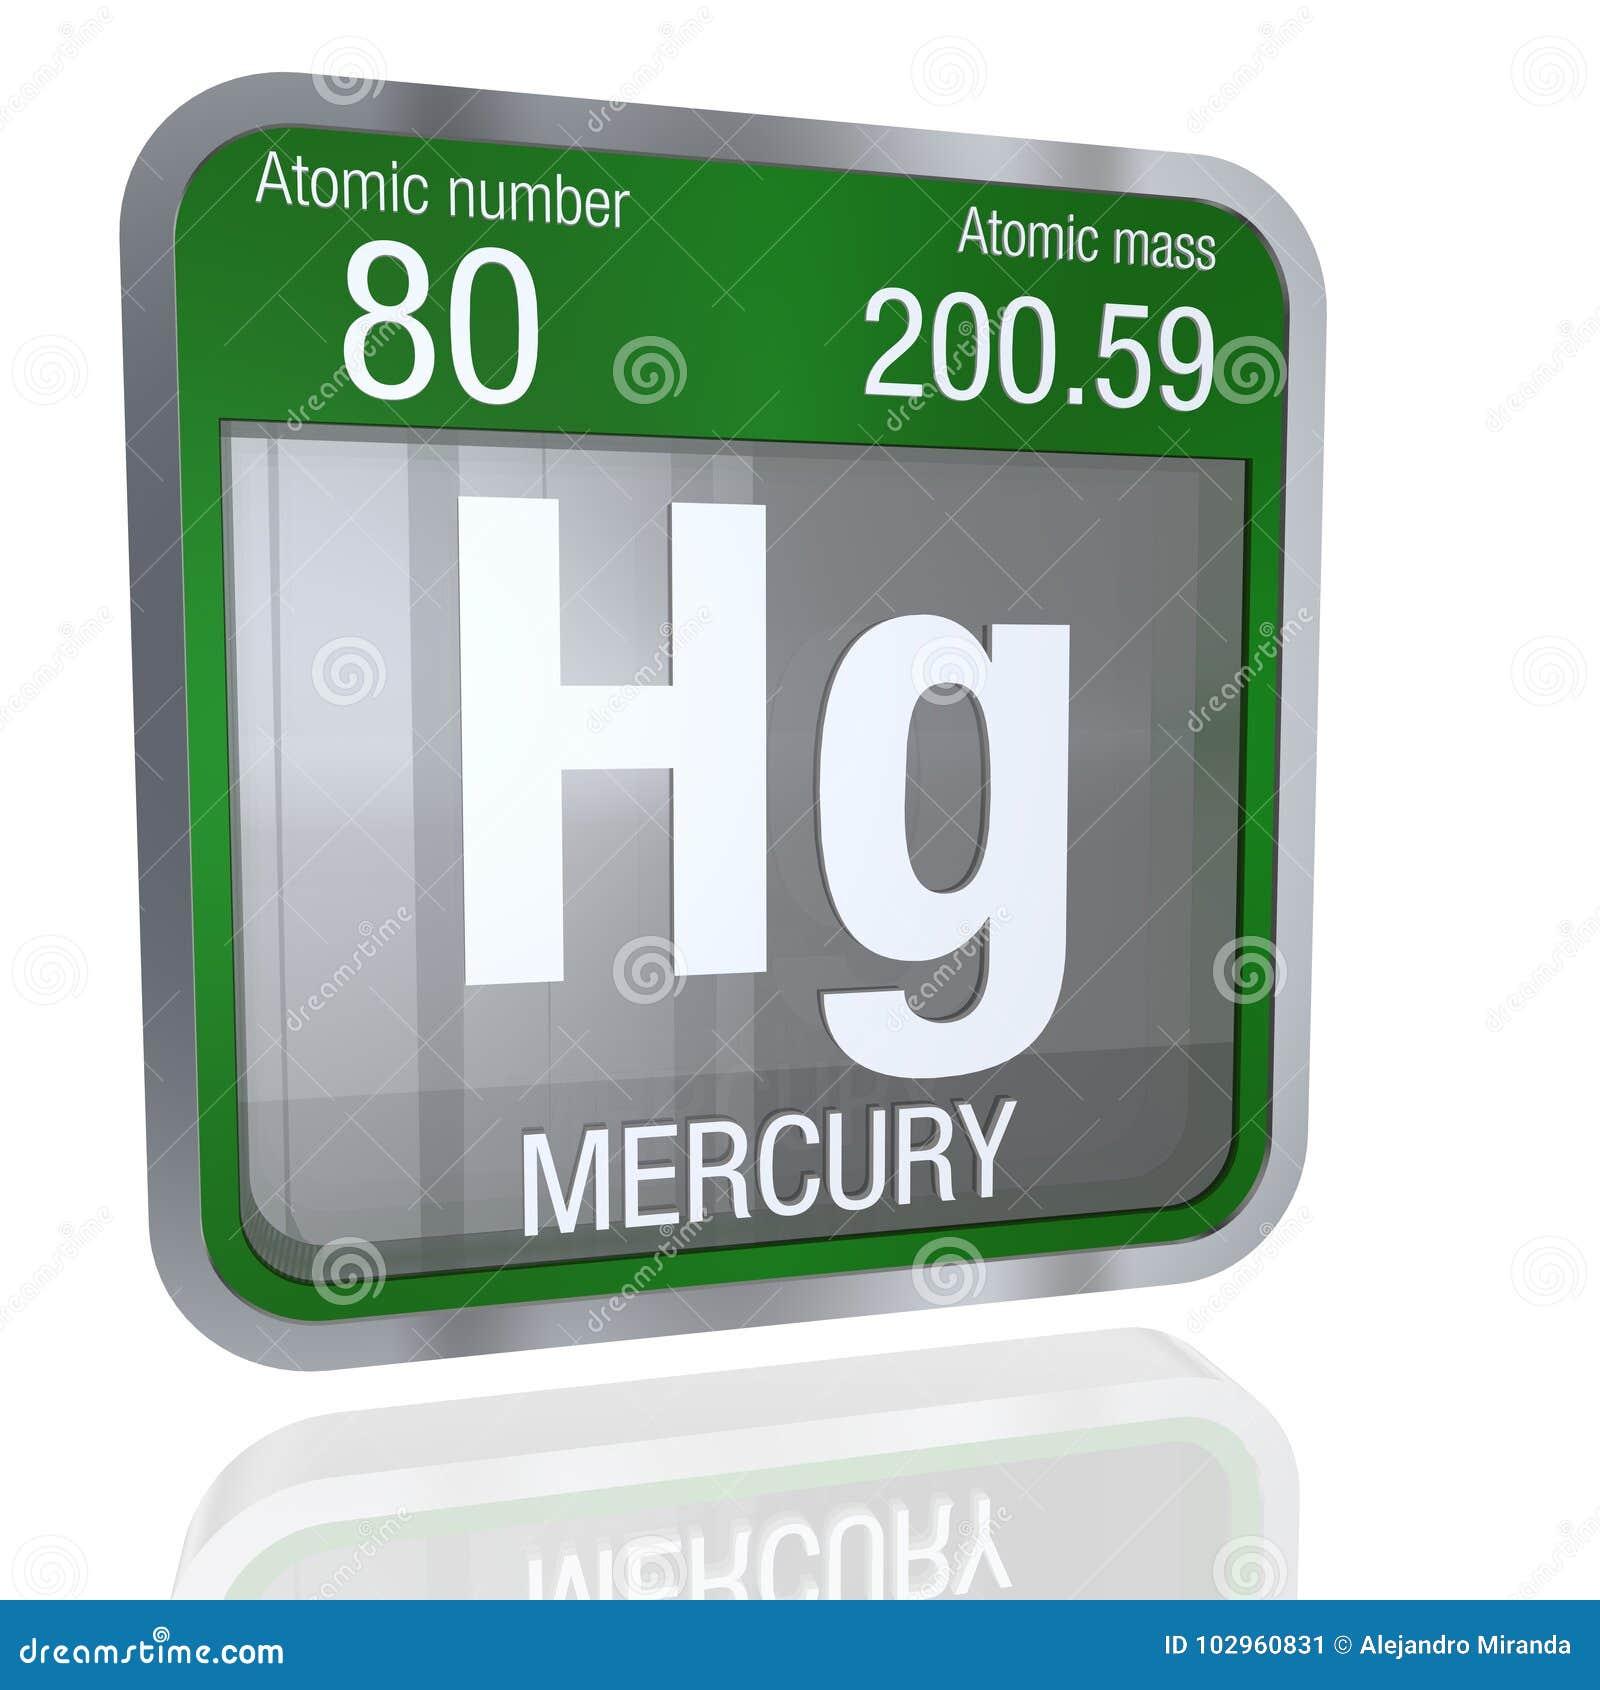 Mercury Symbol In Square Shape With Metallic Border And Transparent